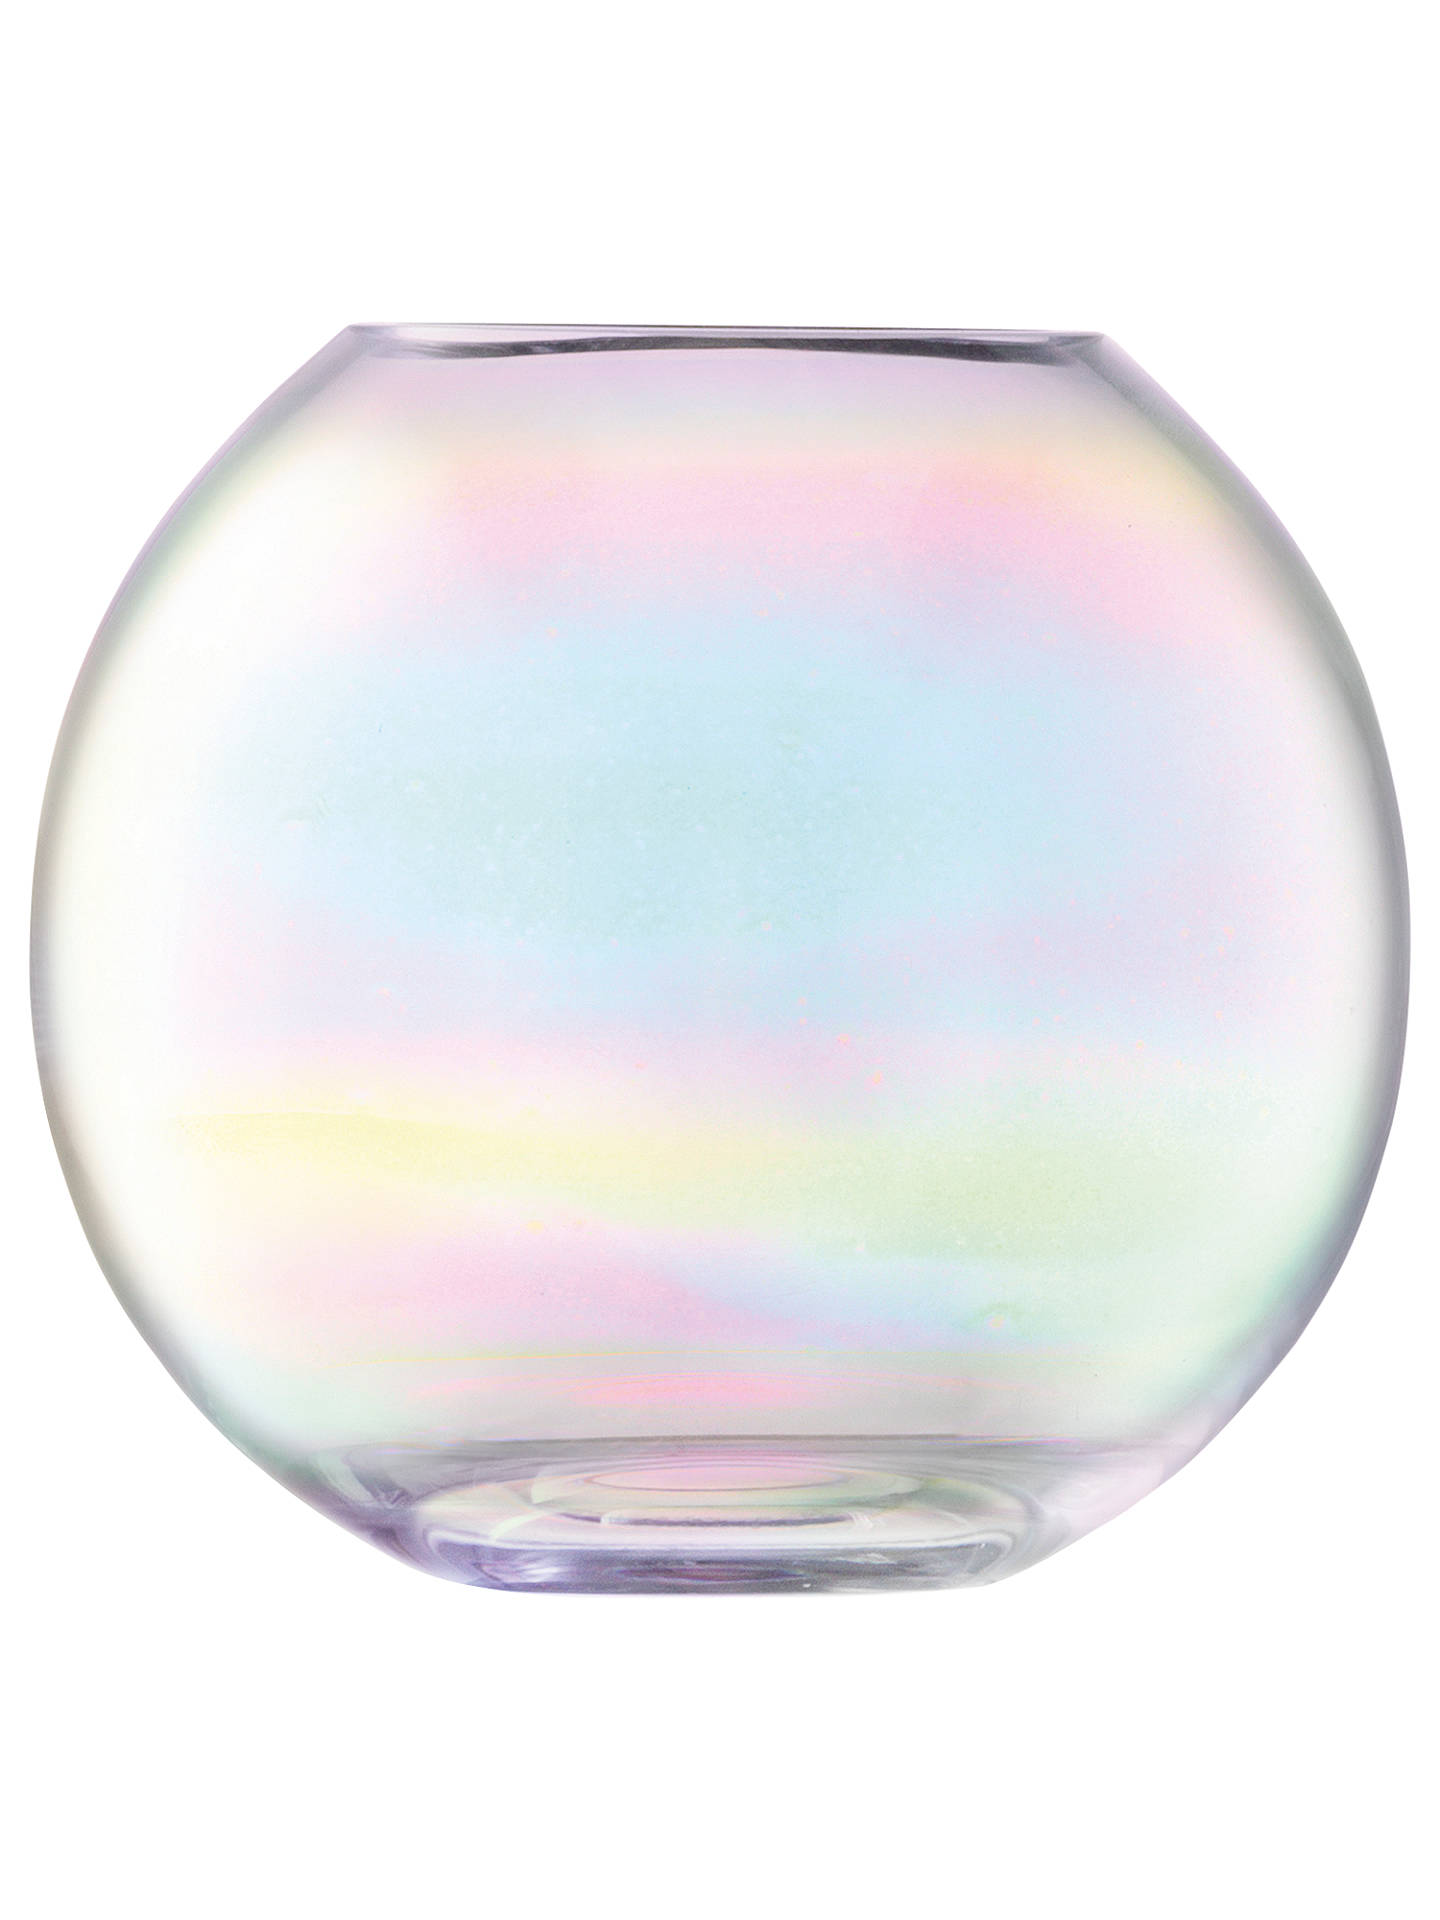 Lsa International Pearl Vase, 11cm by Lsa International